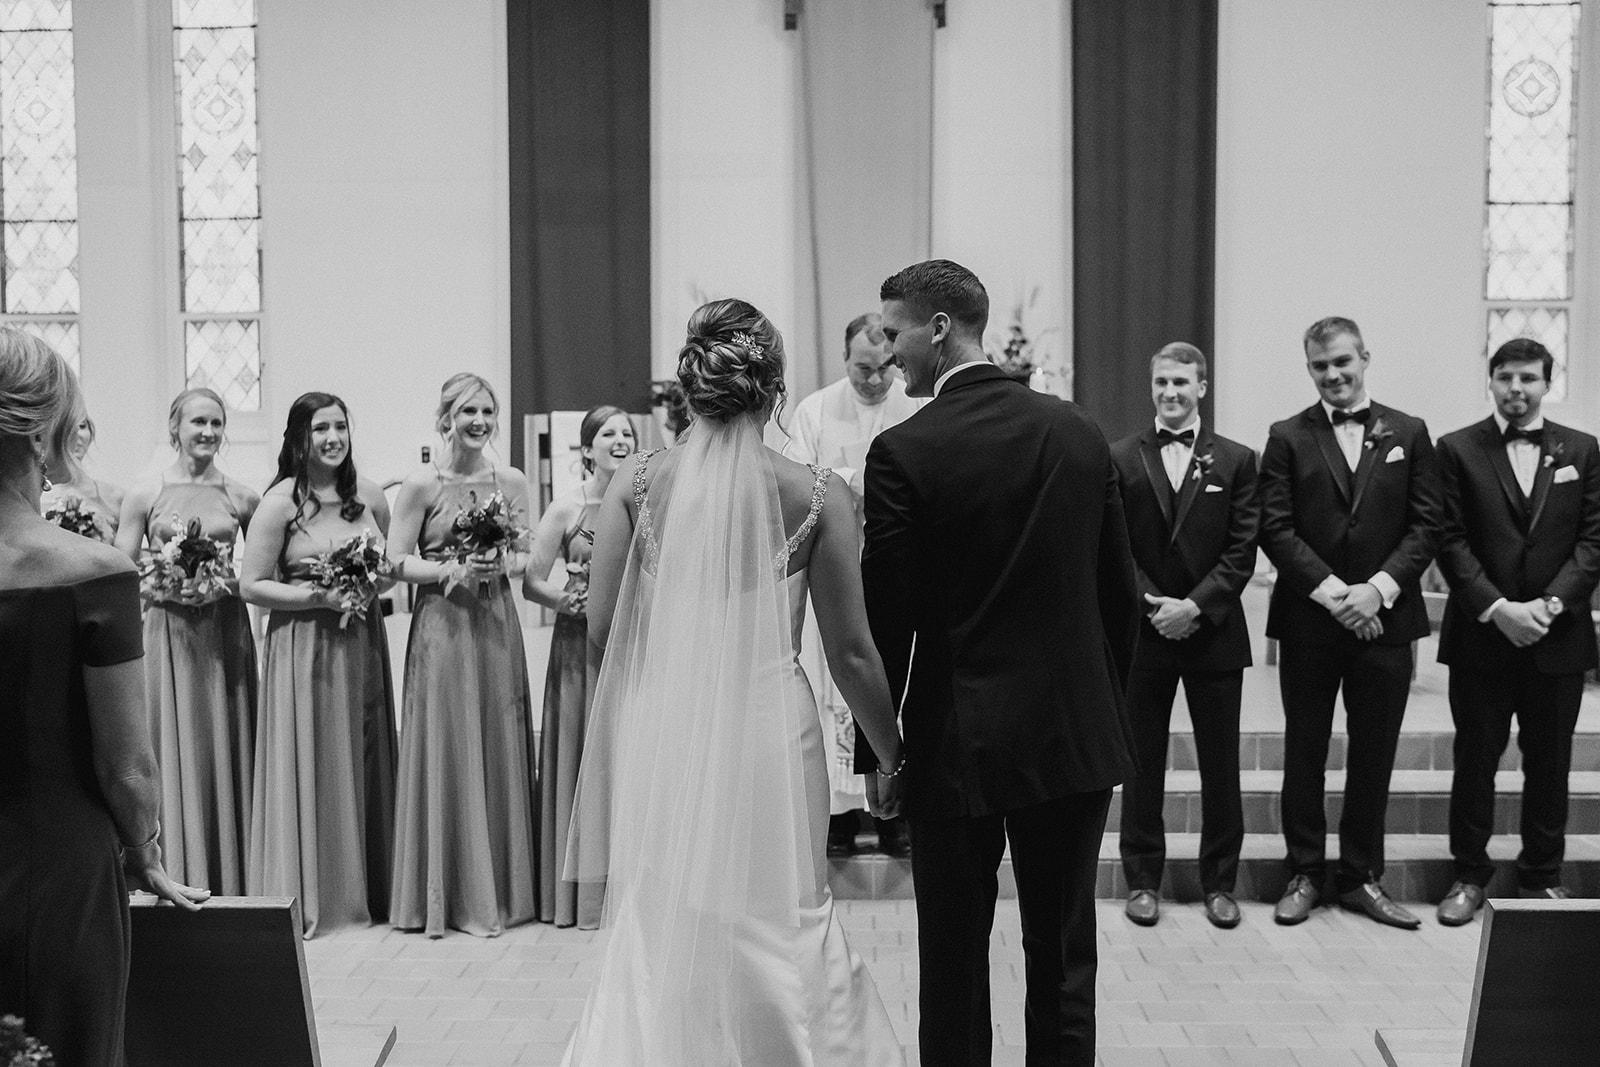 Scott and Andrea Wedding 2018-546-2.jpg